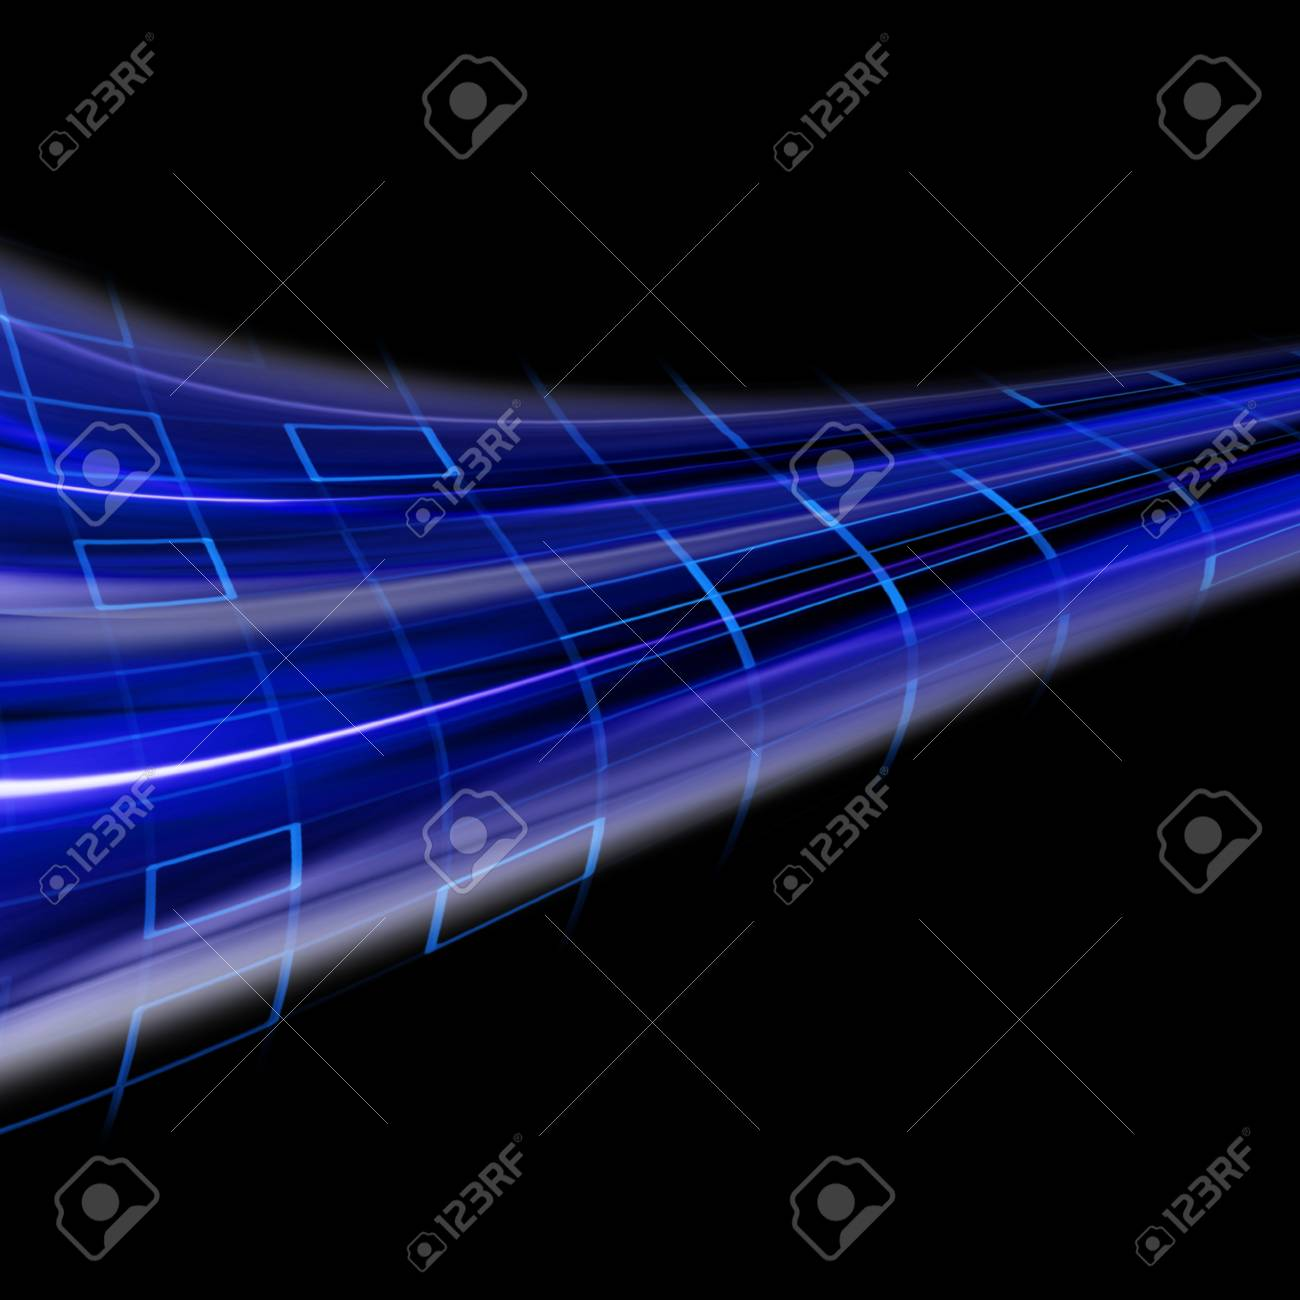 Abstract futuristic background design Stock Photo - 10889212